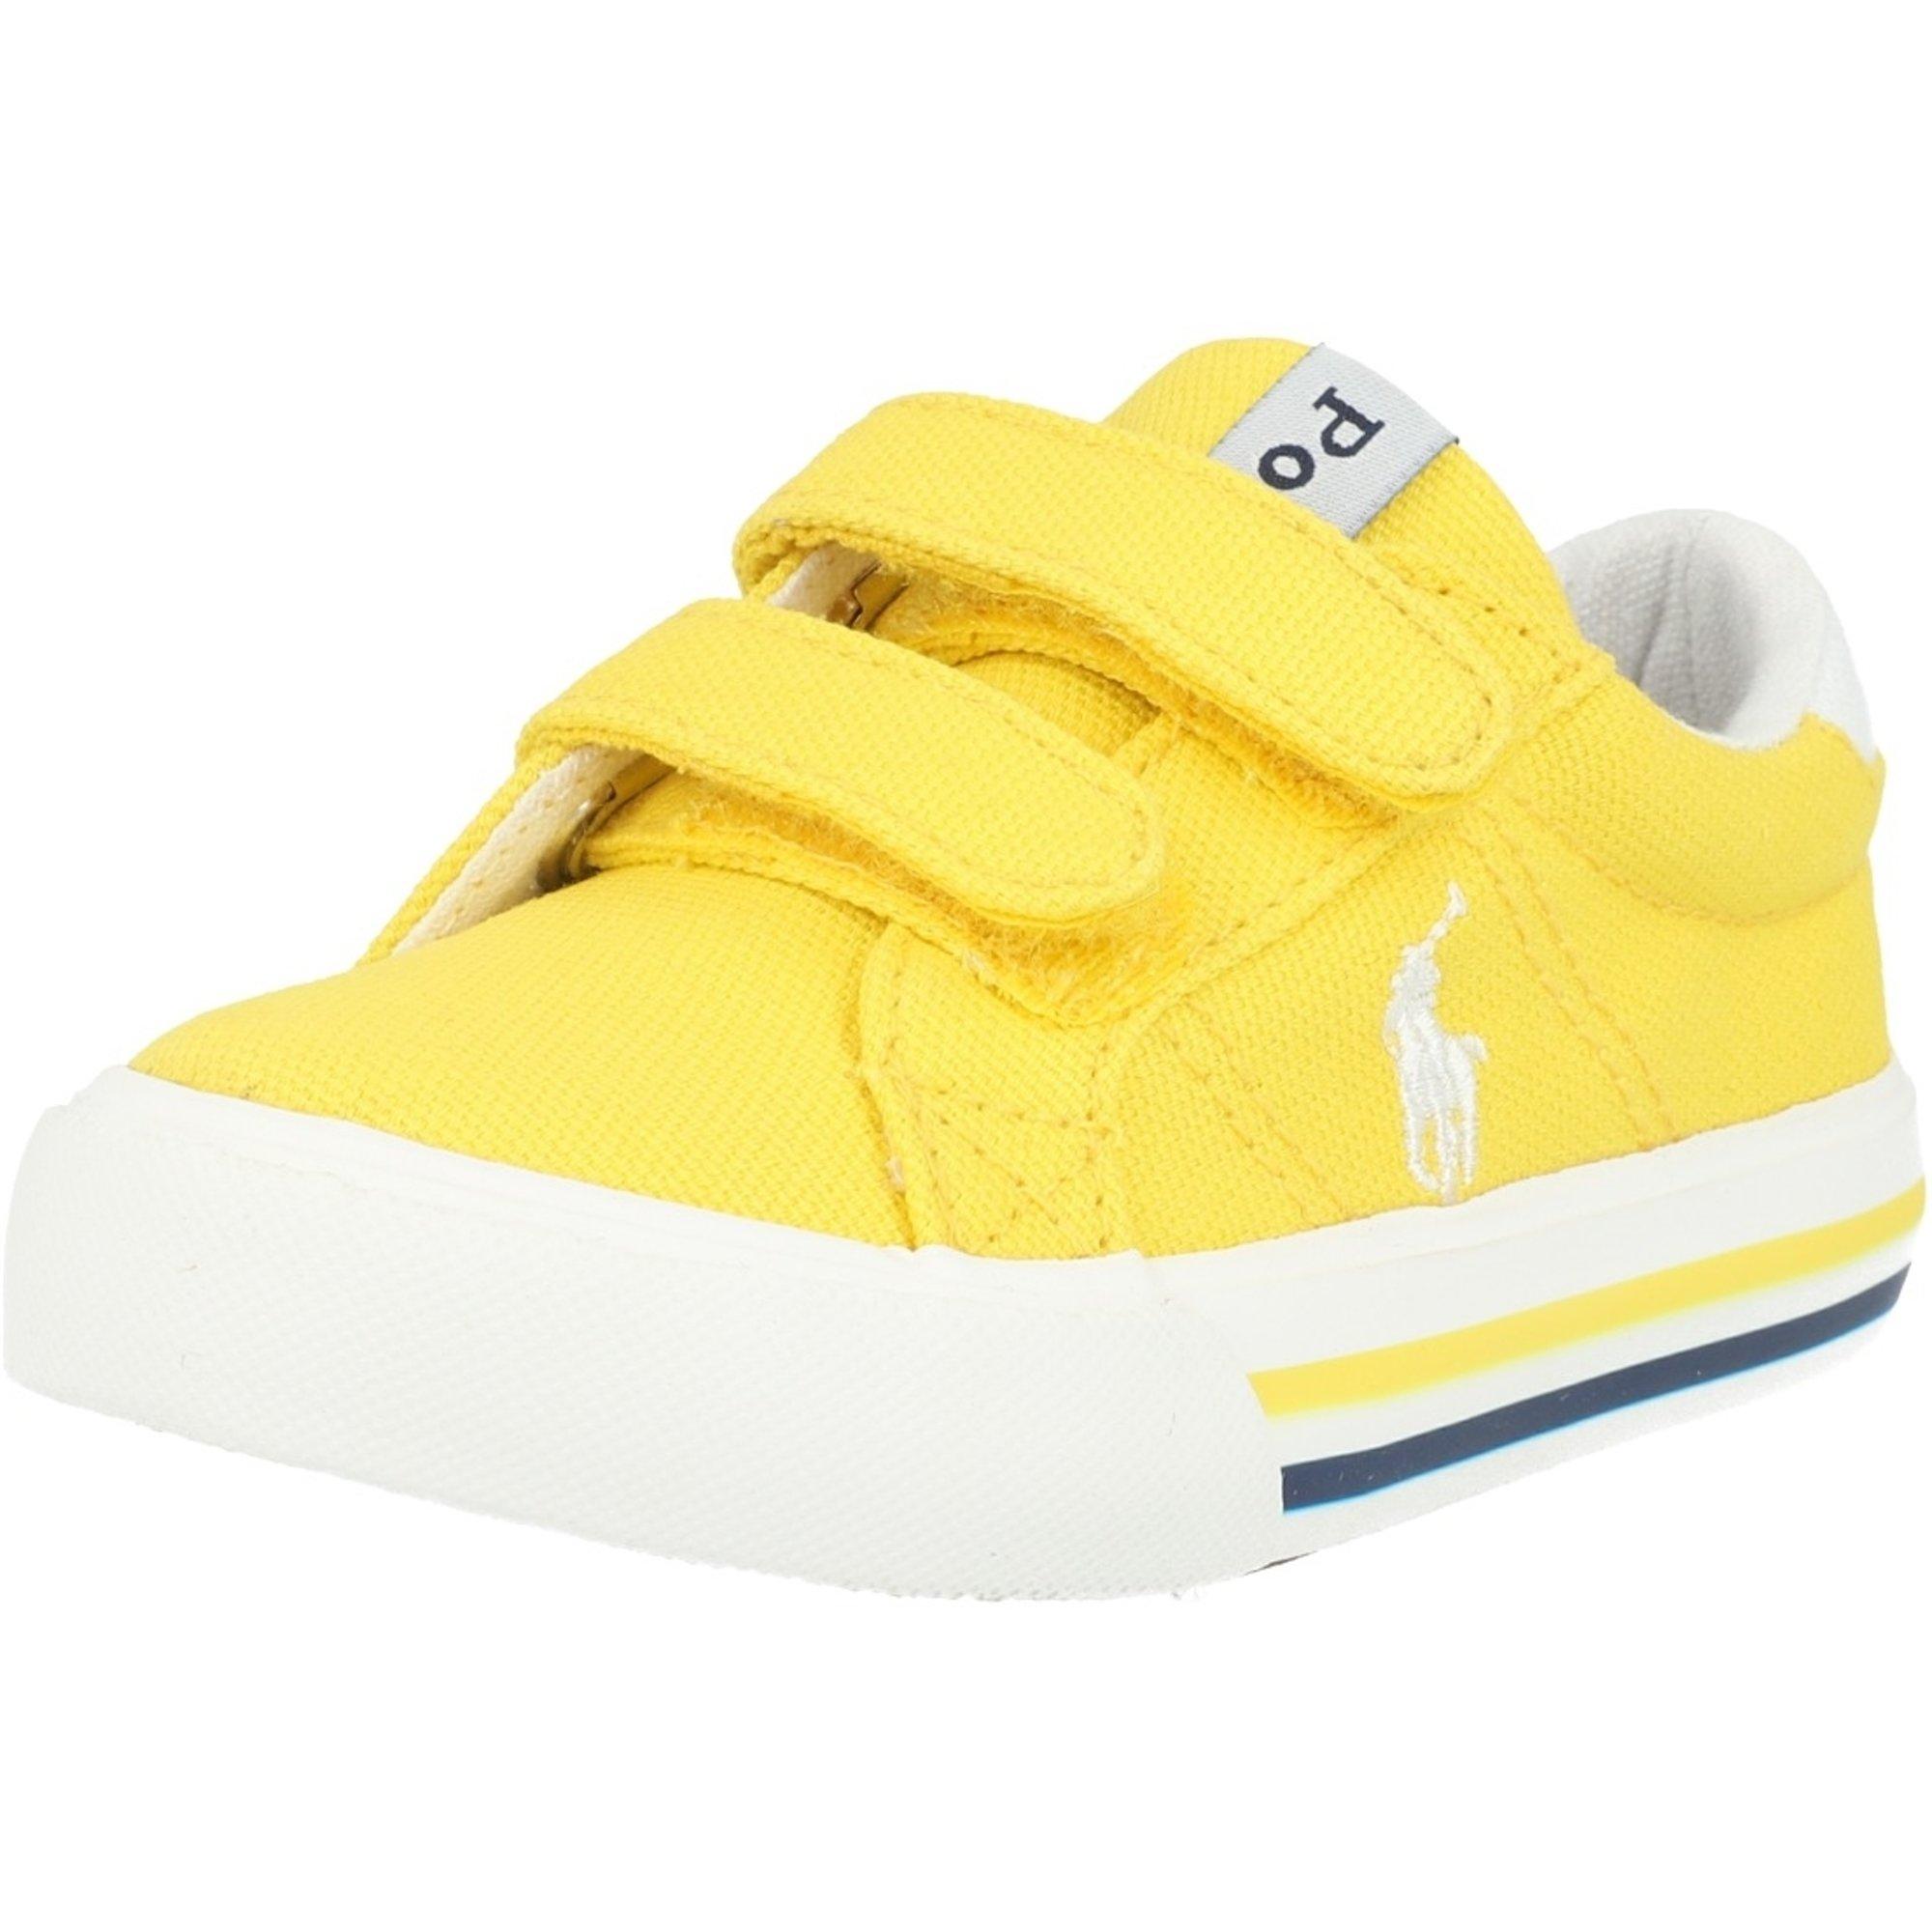 Polo Ralph Lauren Evanston EZ Yellow Canvas Infant